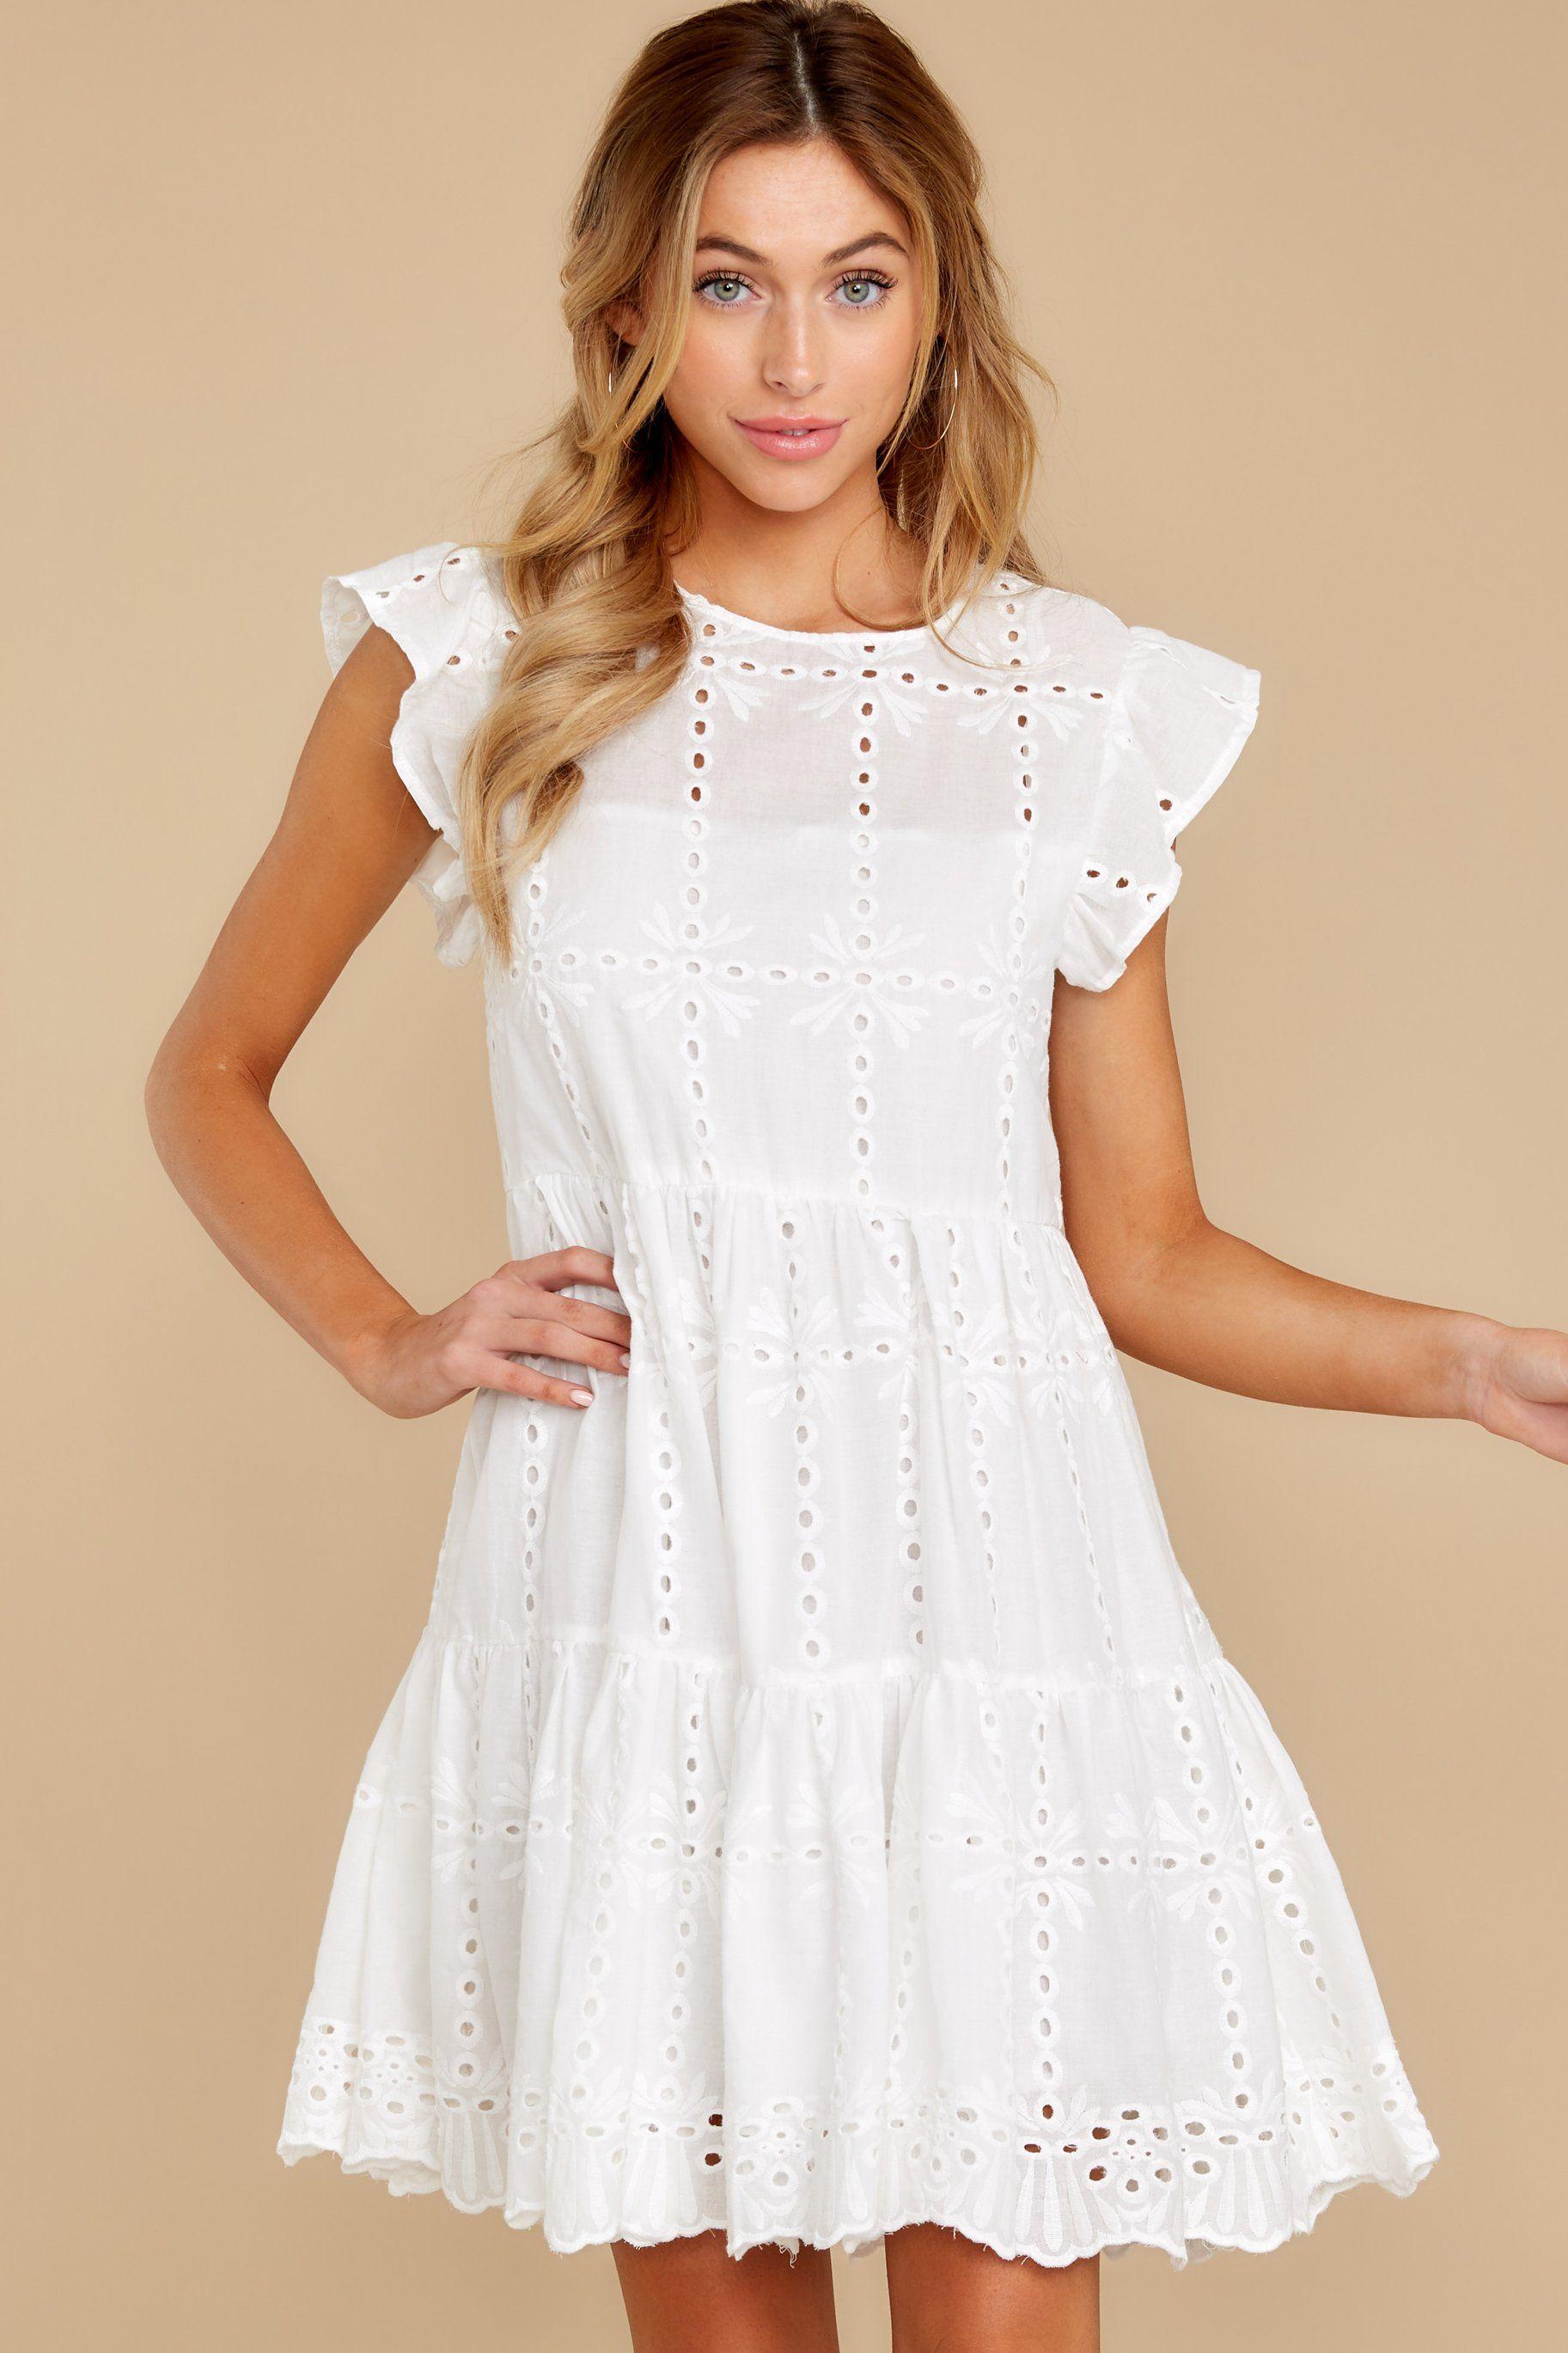 Playful White Dress Eyelet Dress Short Dress 52 00 Red Dress Short Dresses Dresses Red Dress [ 2738 x 1825 Pixel ]